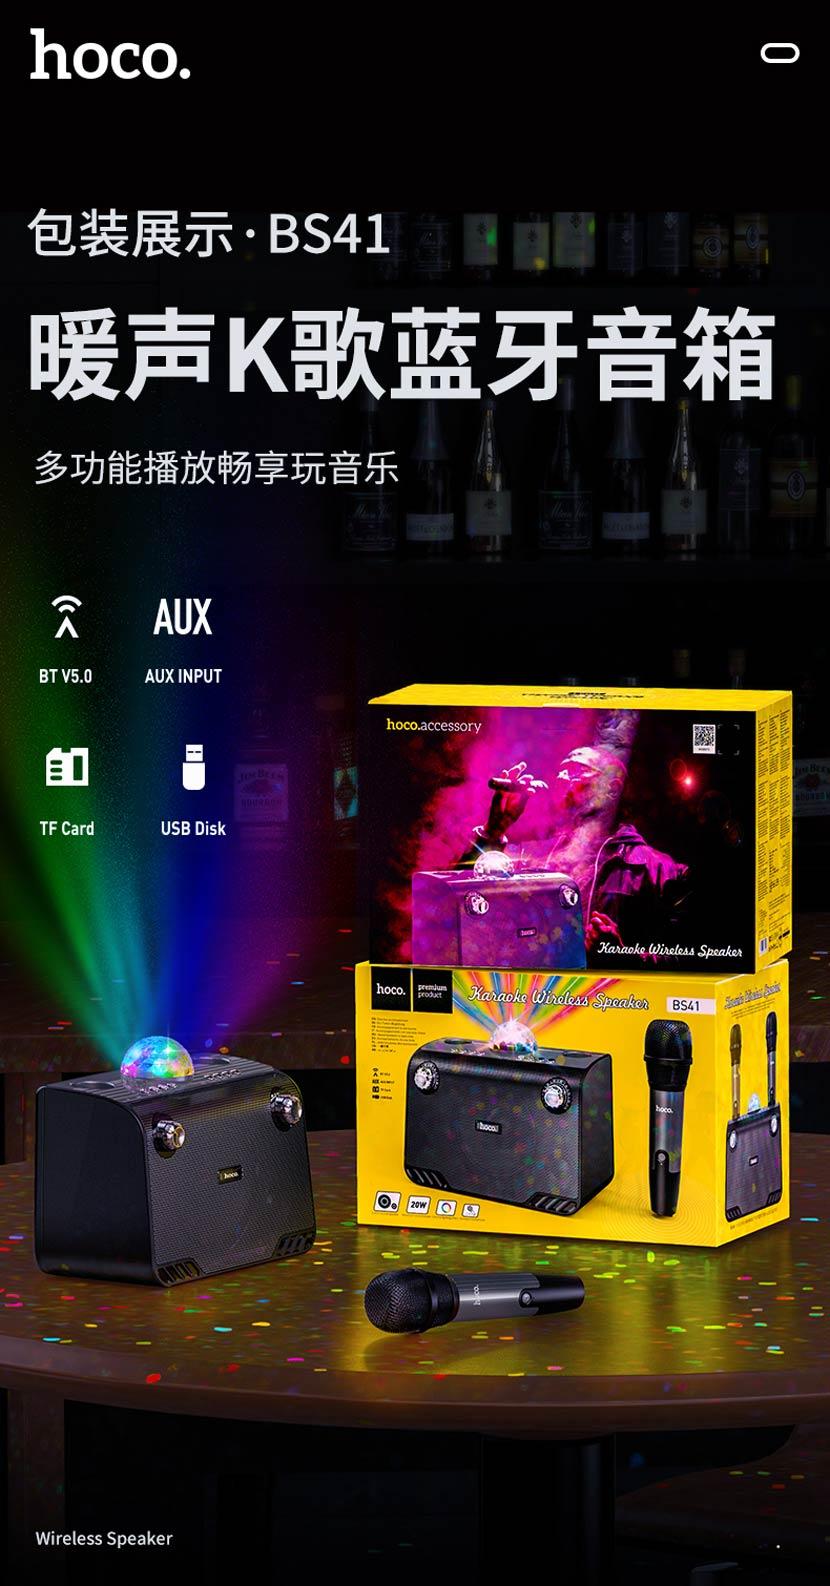 hoco news bs41 warm sound k song wireless speaker package cn